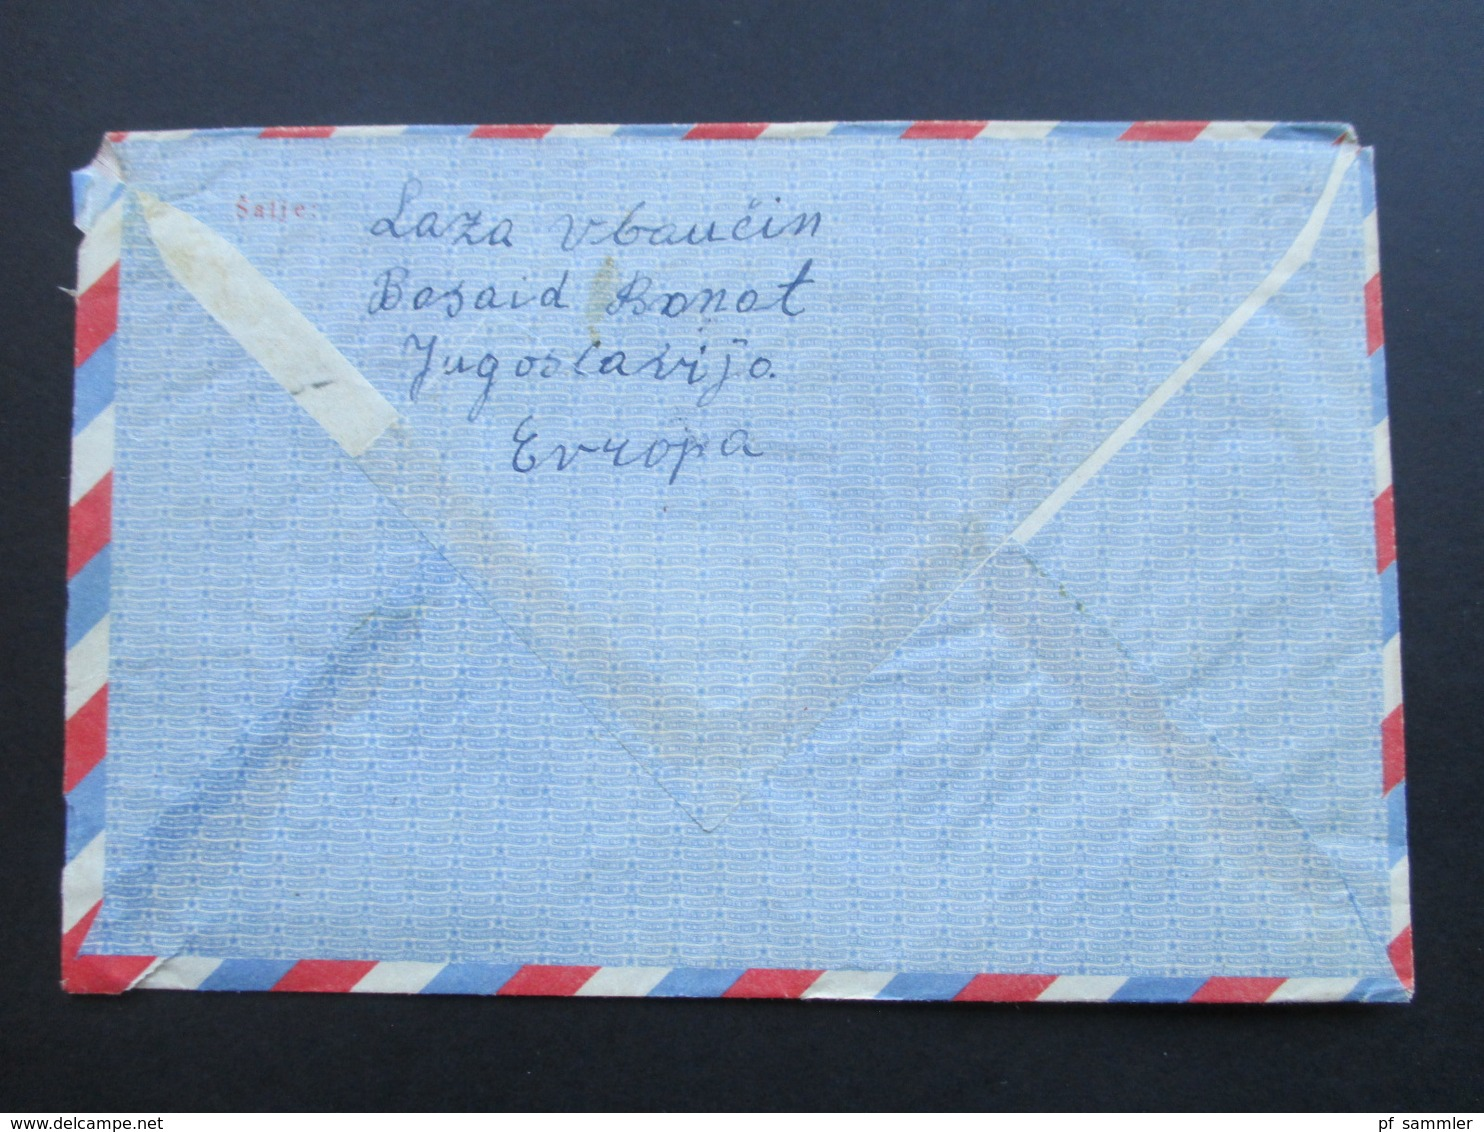 Jugoslawien 1948 / 49 Lufrpostfaltbrief LF 2 Mit 2 Zusatzfrankaturen Nach Detroit USA. - 1945-1992 Repubblica Socialista Federale Di Jugoslavia